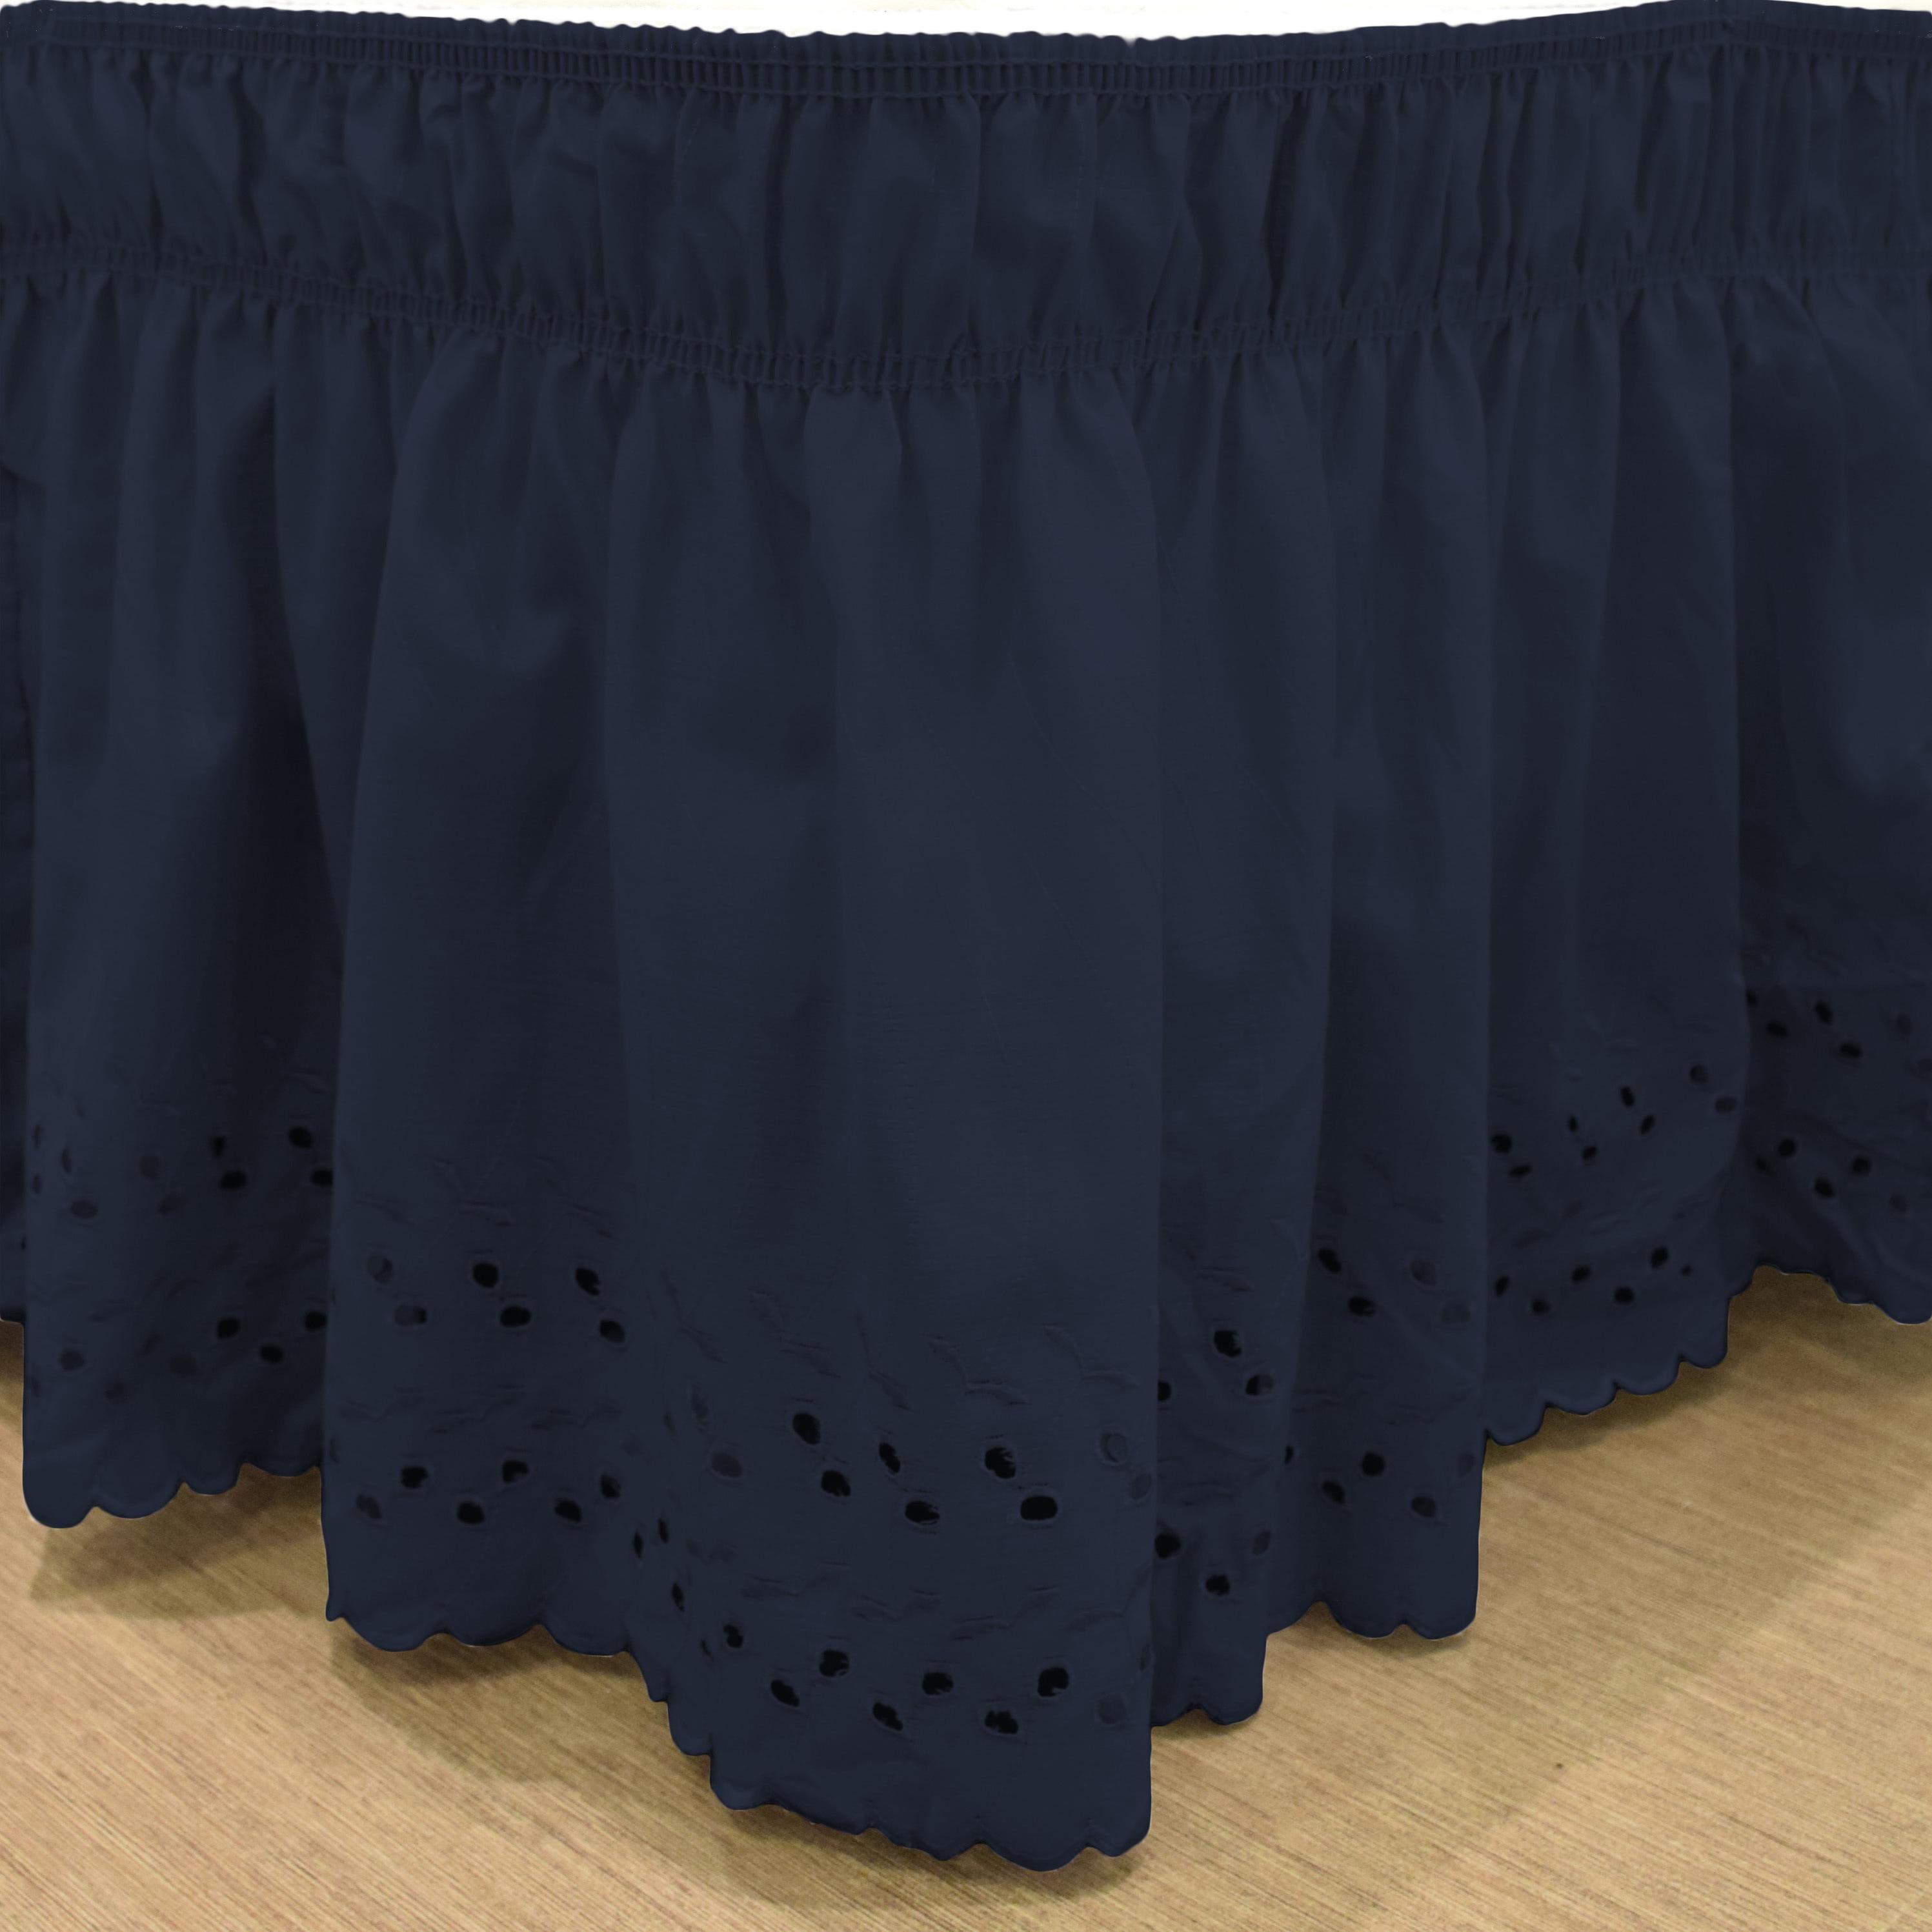 Gracewood Hollow Millum Wrap-Around Eyelet Ruffled Bed Skirt